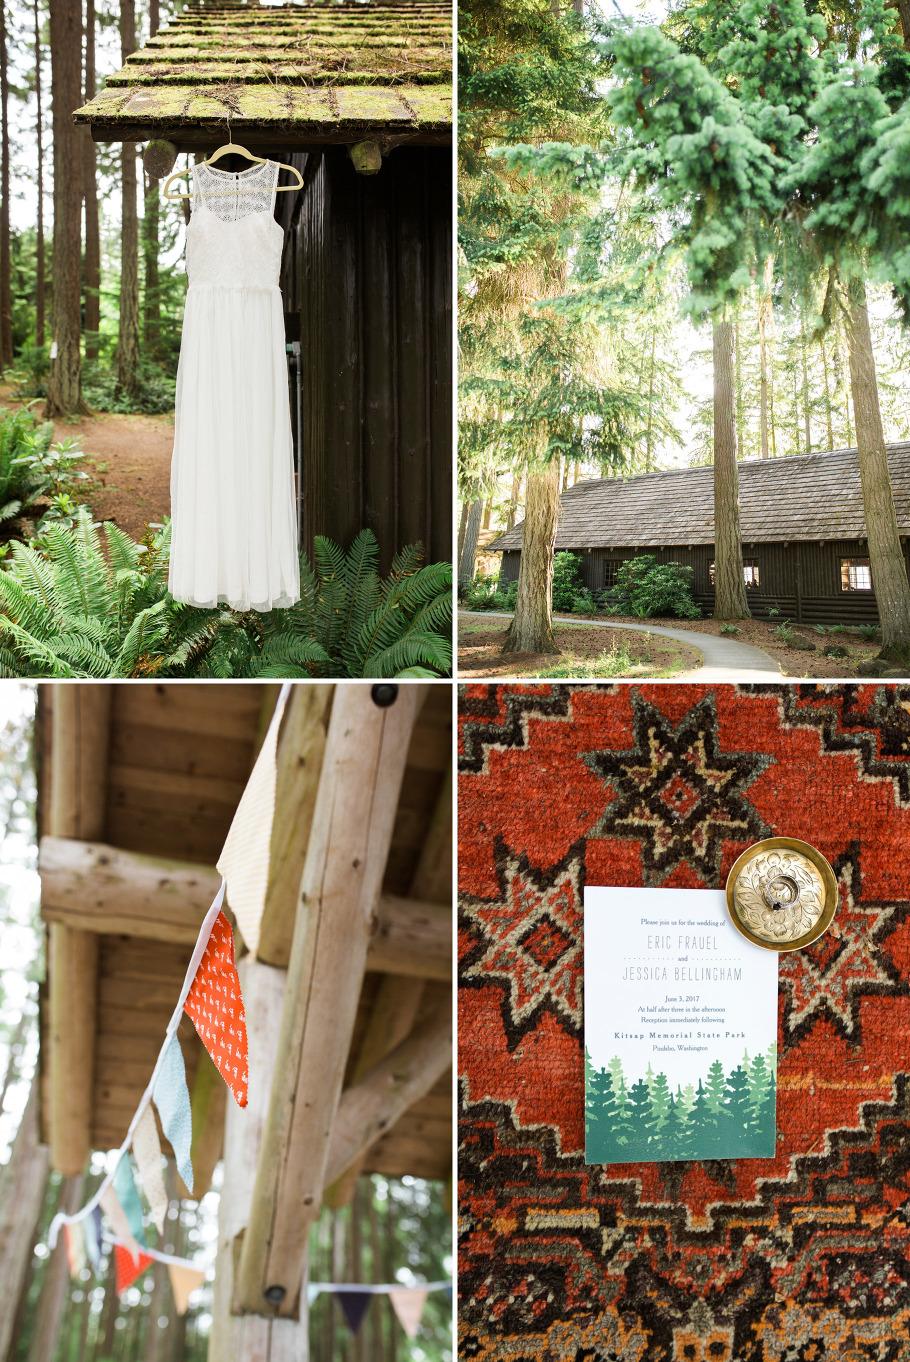 3-kitsap-memorial-state-park-wedding-seattle-photographer-northwest-wedding-day-photography-modcloth-bridal-gown-dress